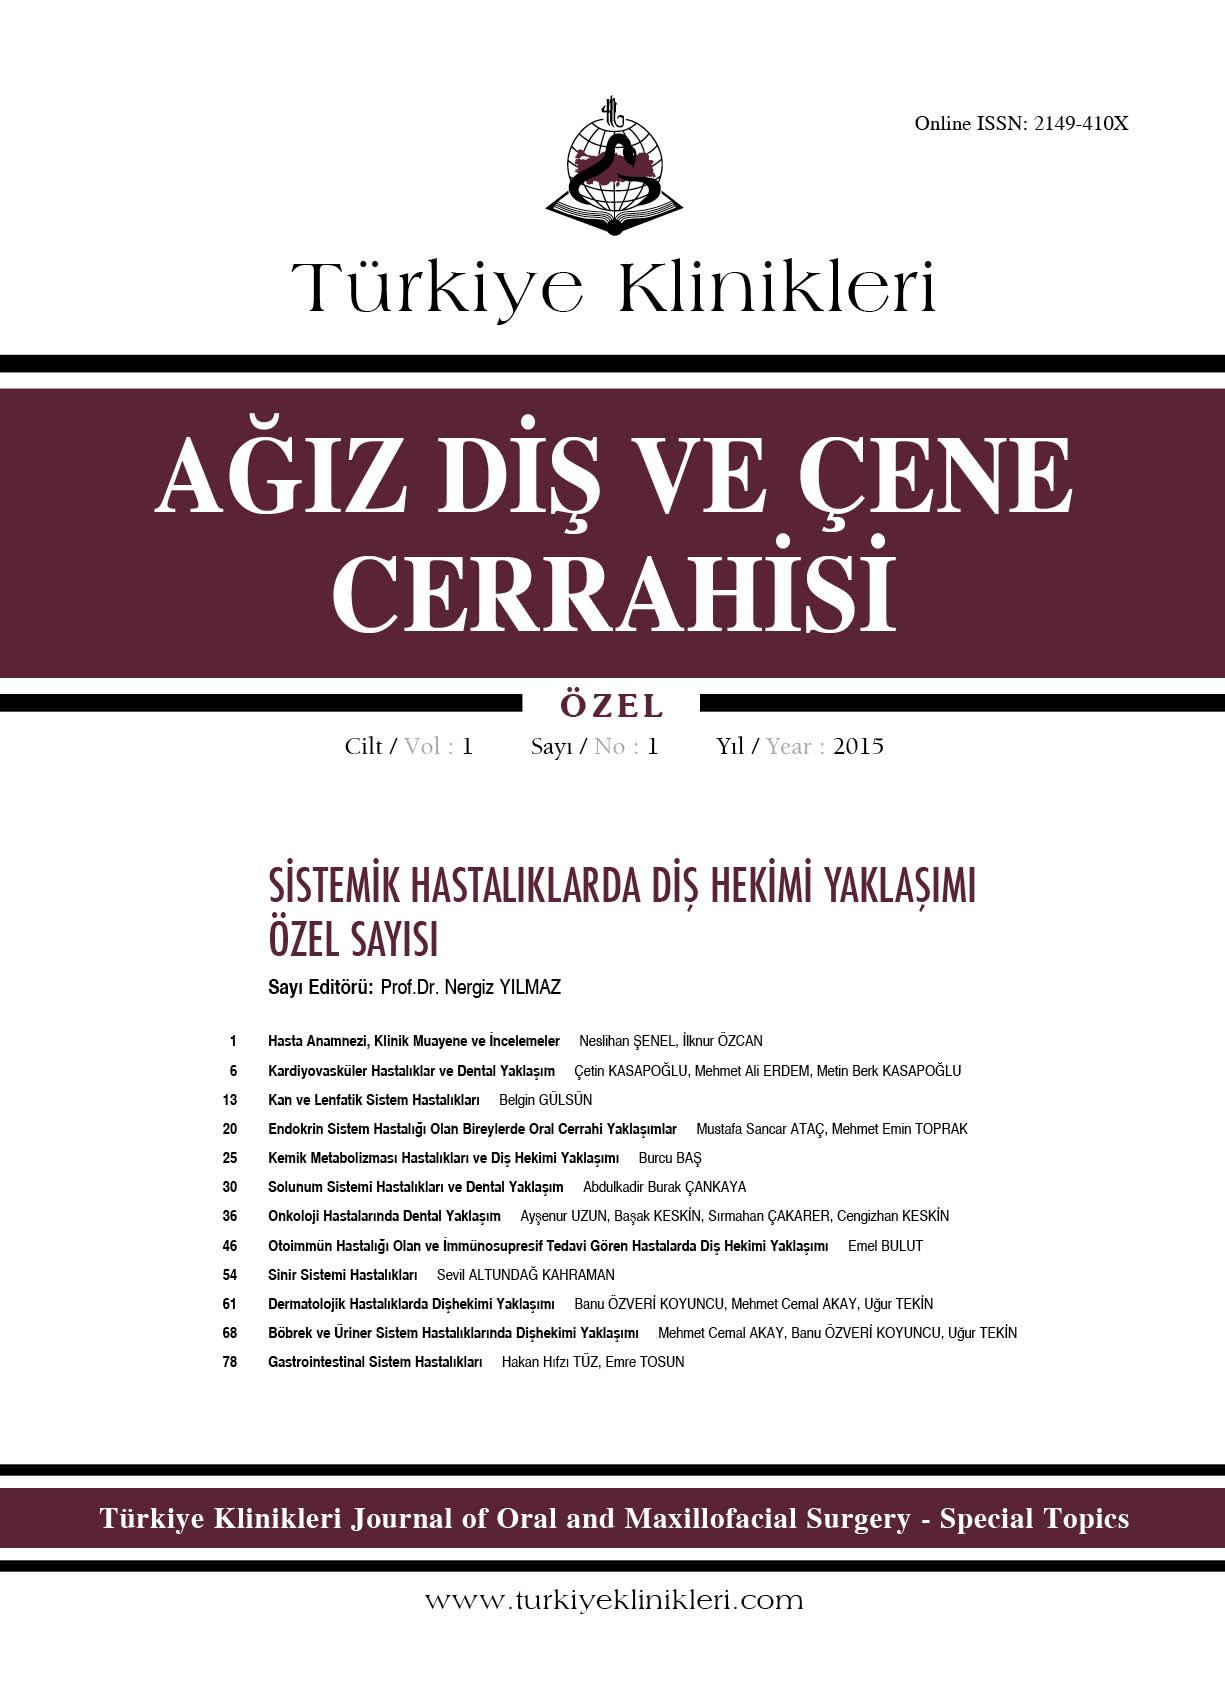 journal of oral maxillofacial surgery: